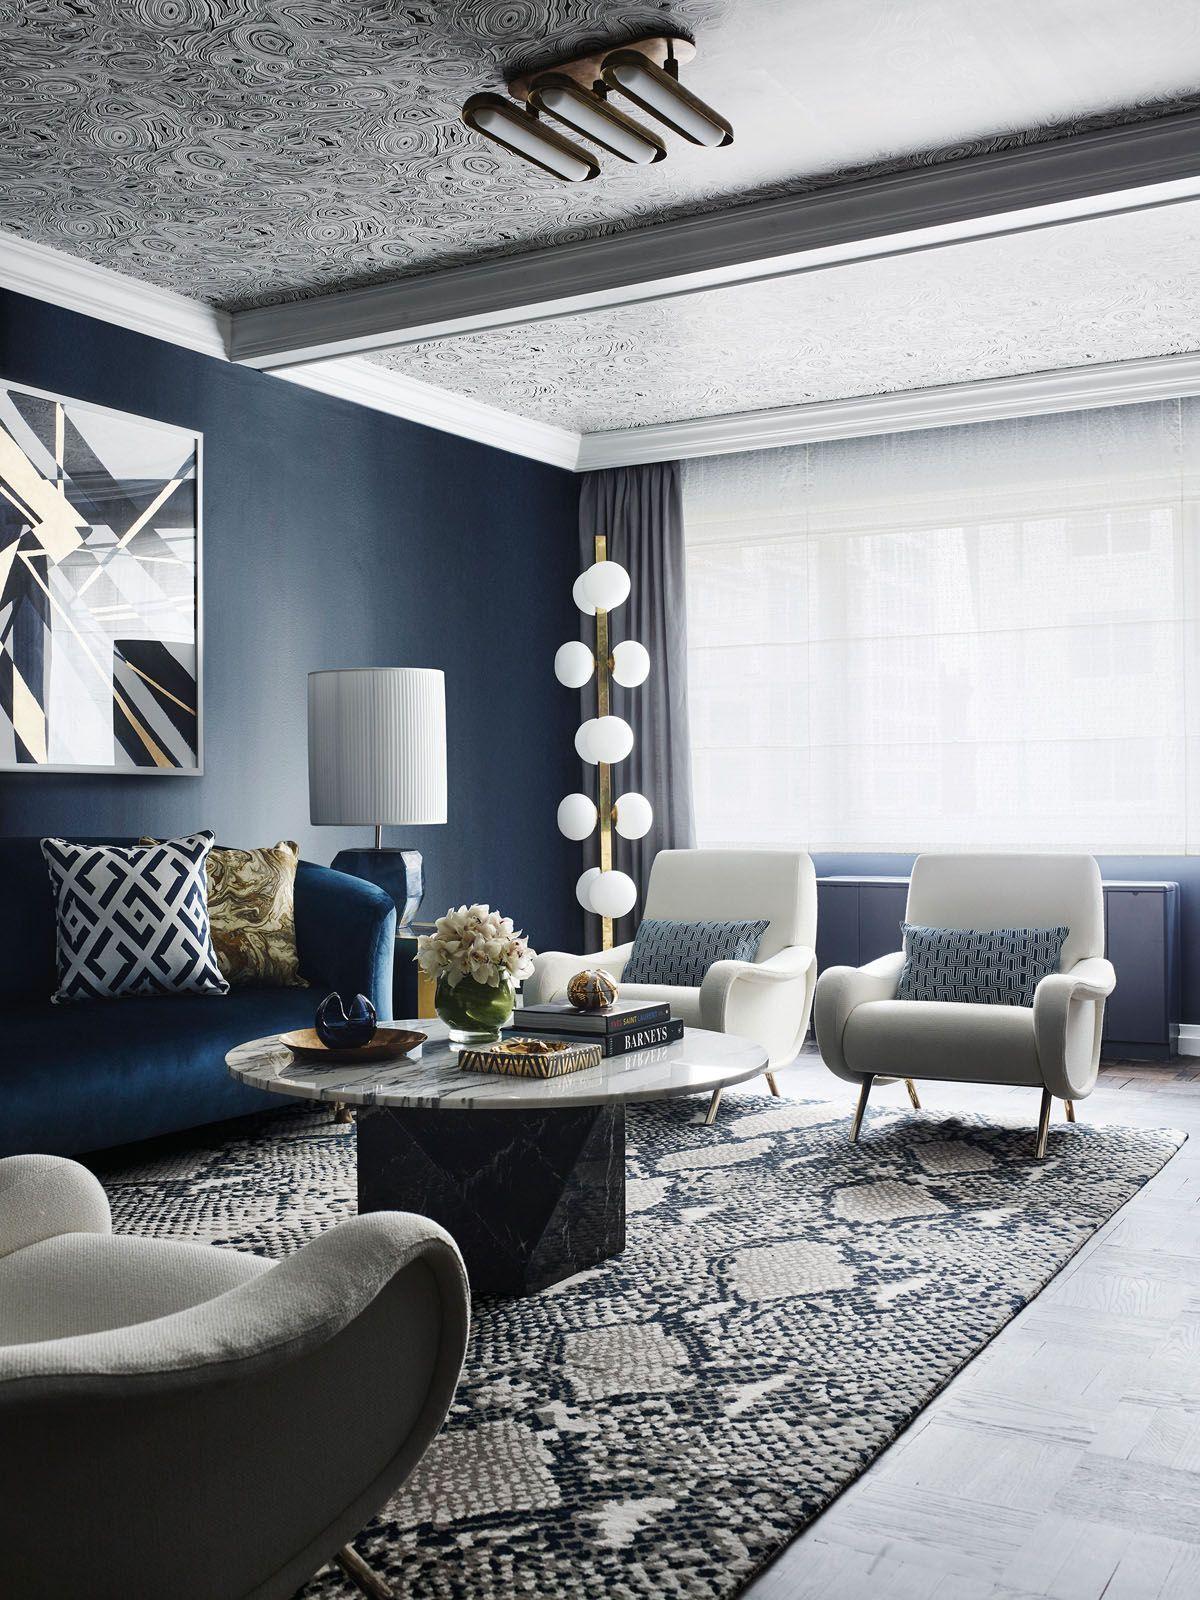 Pin By Tatler Homes Singapore On Laura Liew Home Interior Design Interior Design Living Room Designs